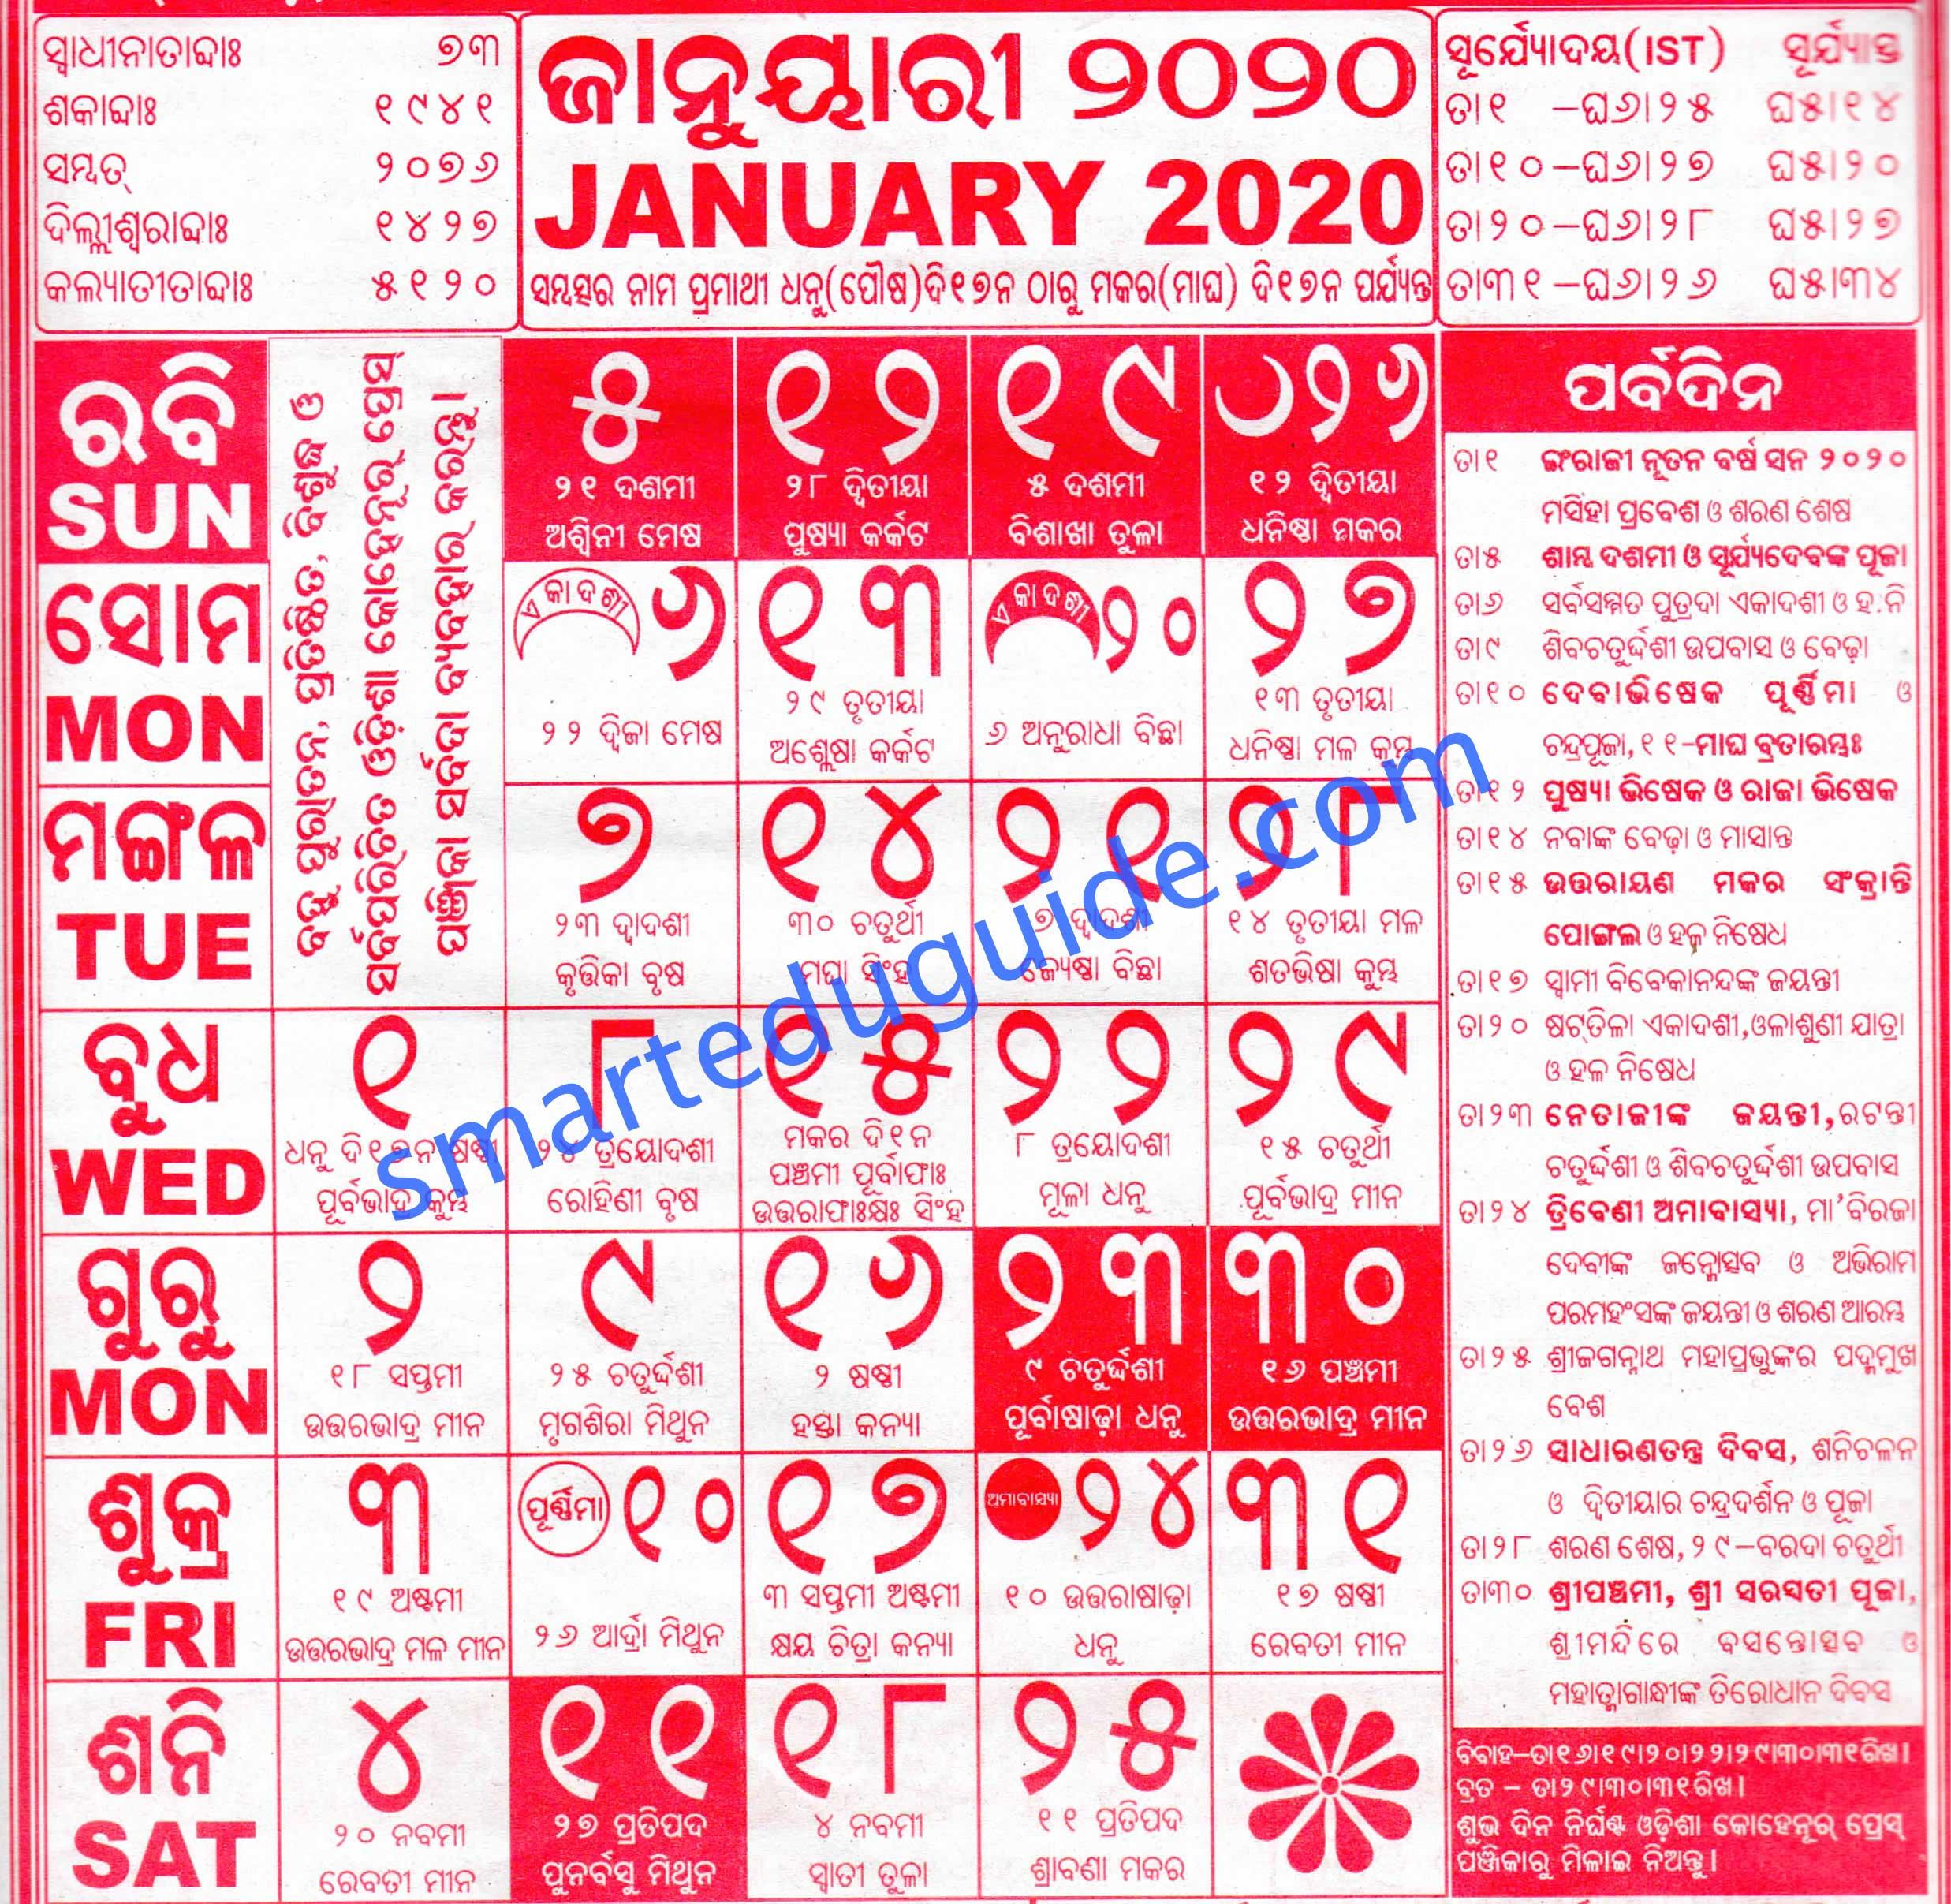 Odia Calendar 2020 Kohinoor Pdf | Seg throughout 2020 Oriya Calendar